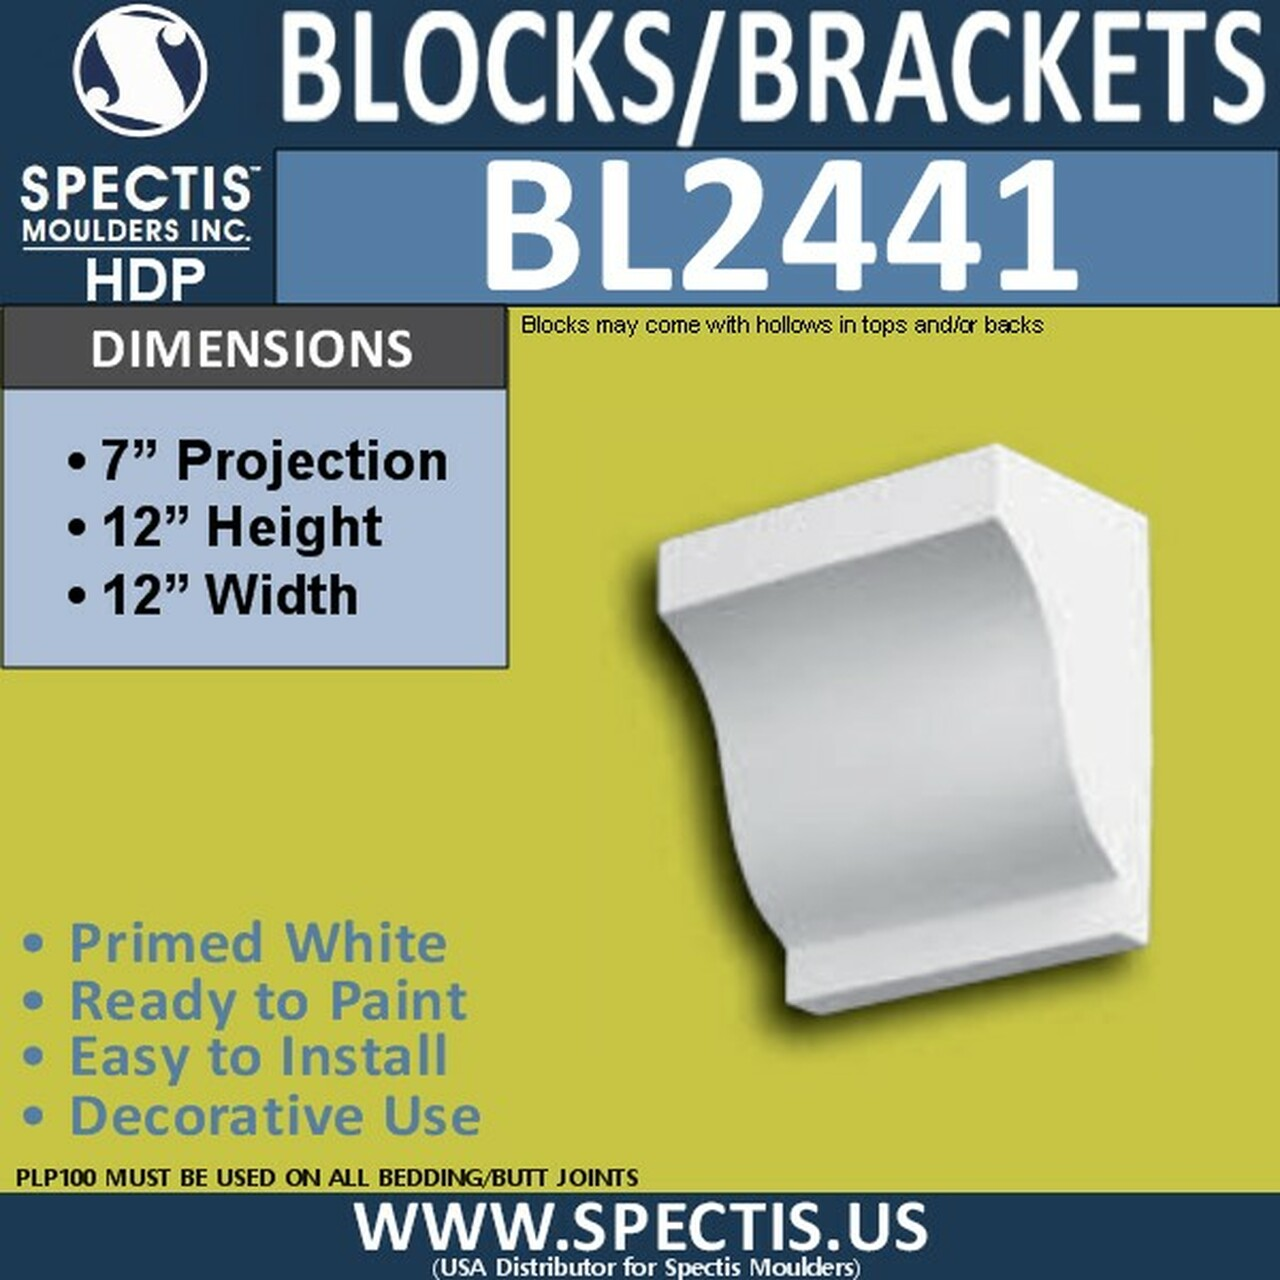 "BL2441 Eave Block or Bracket 12""W x 12""H x 7"" P"